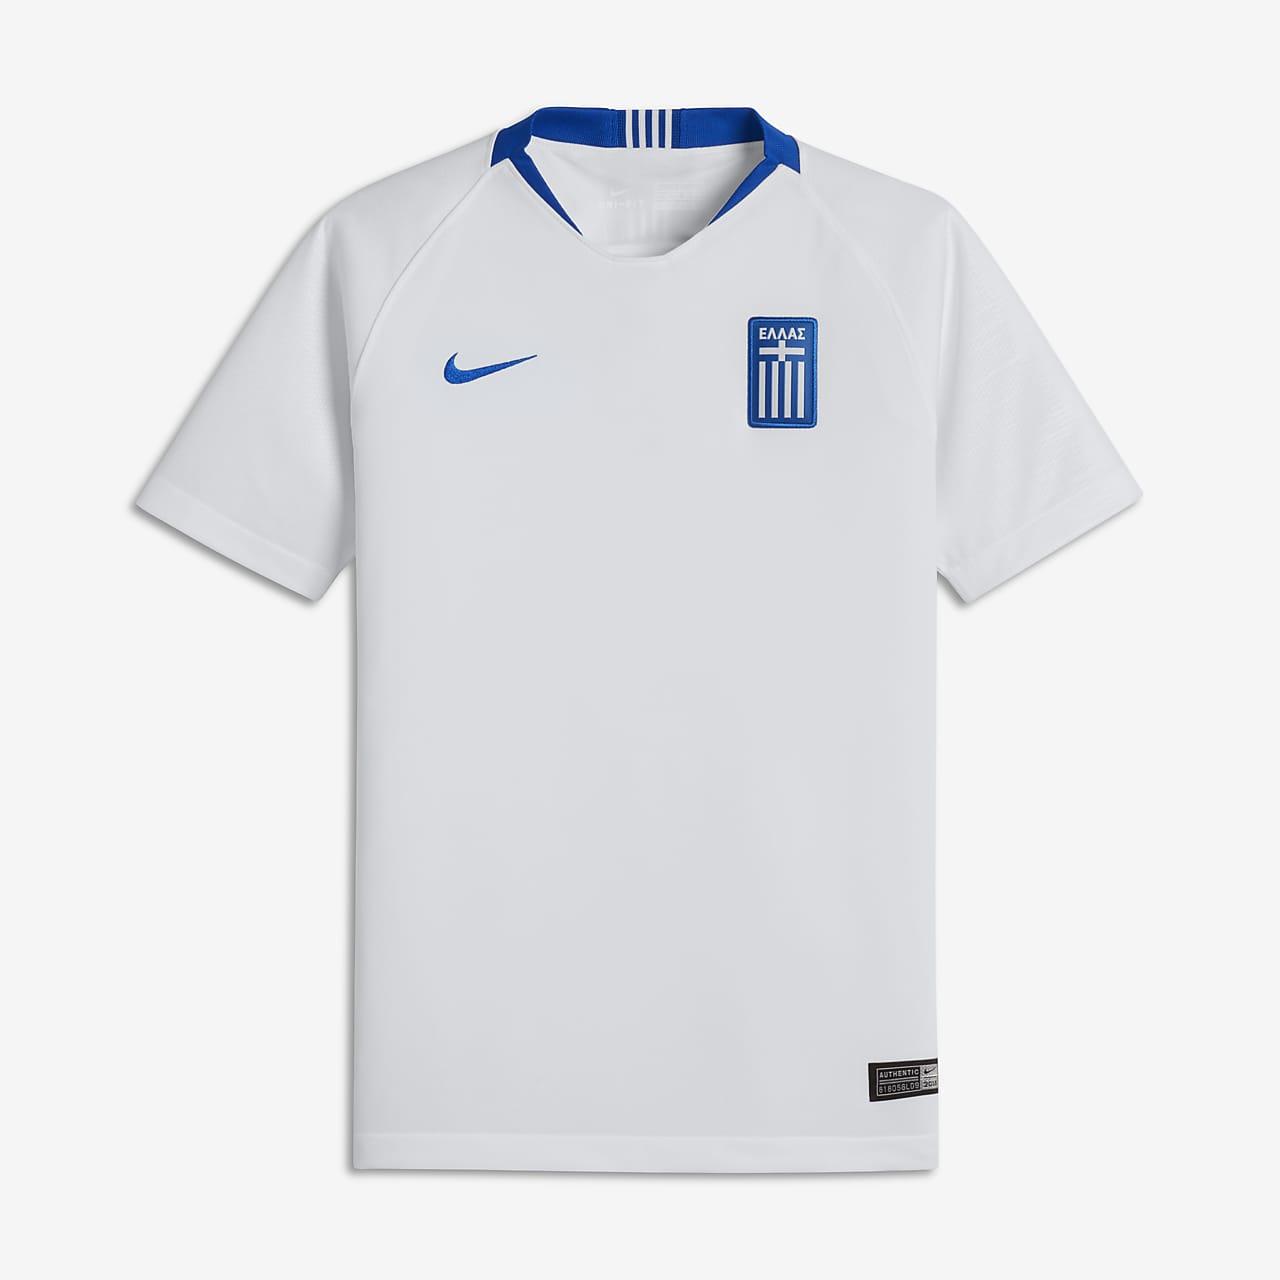 2018 Greece Stadium Home Camiseta de fútbol - Niño/a